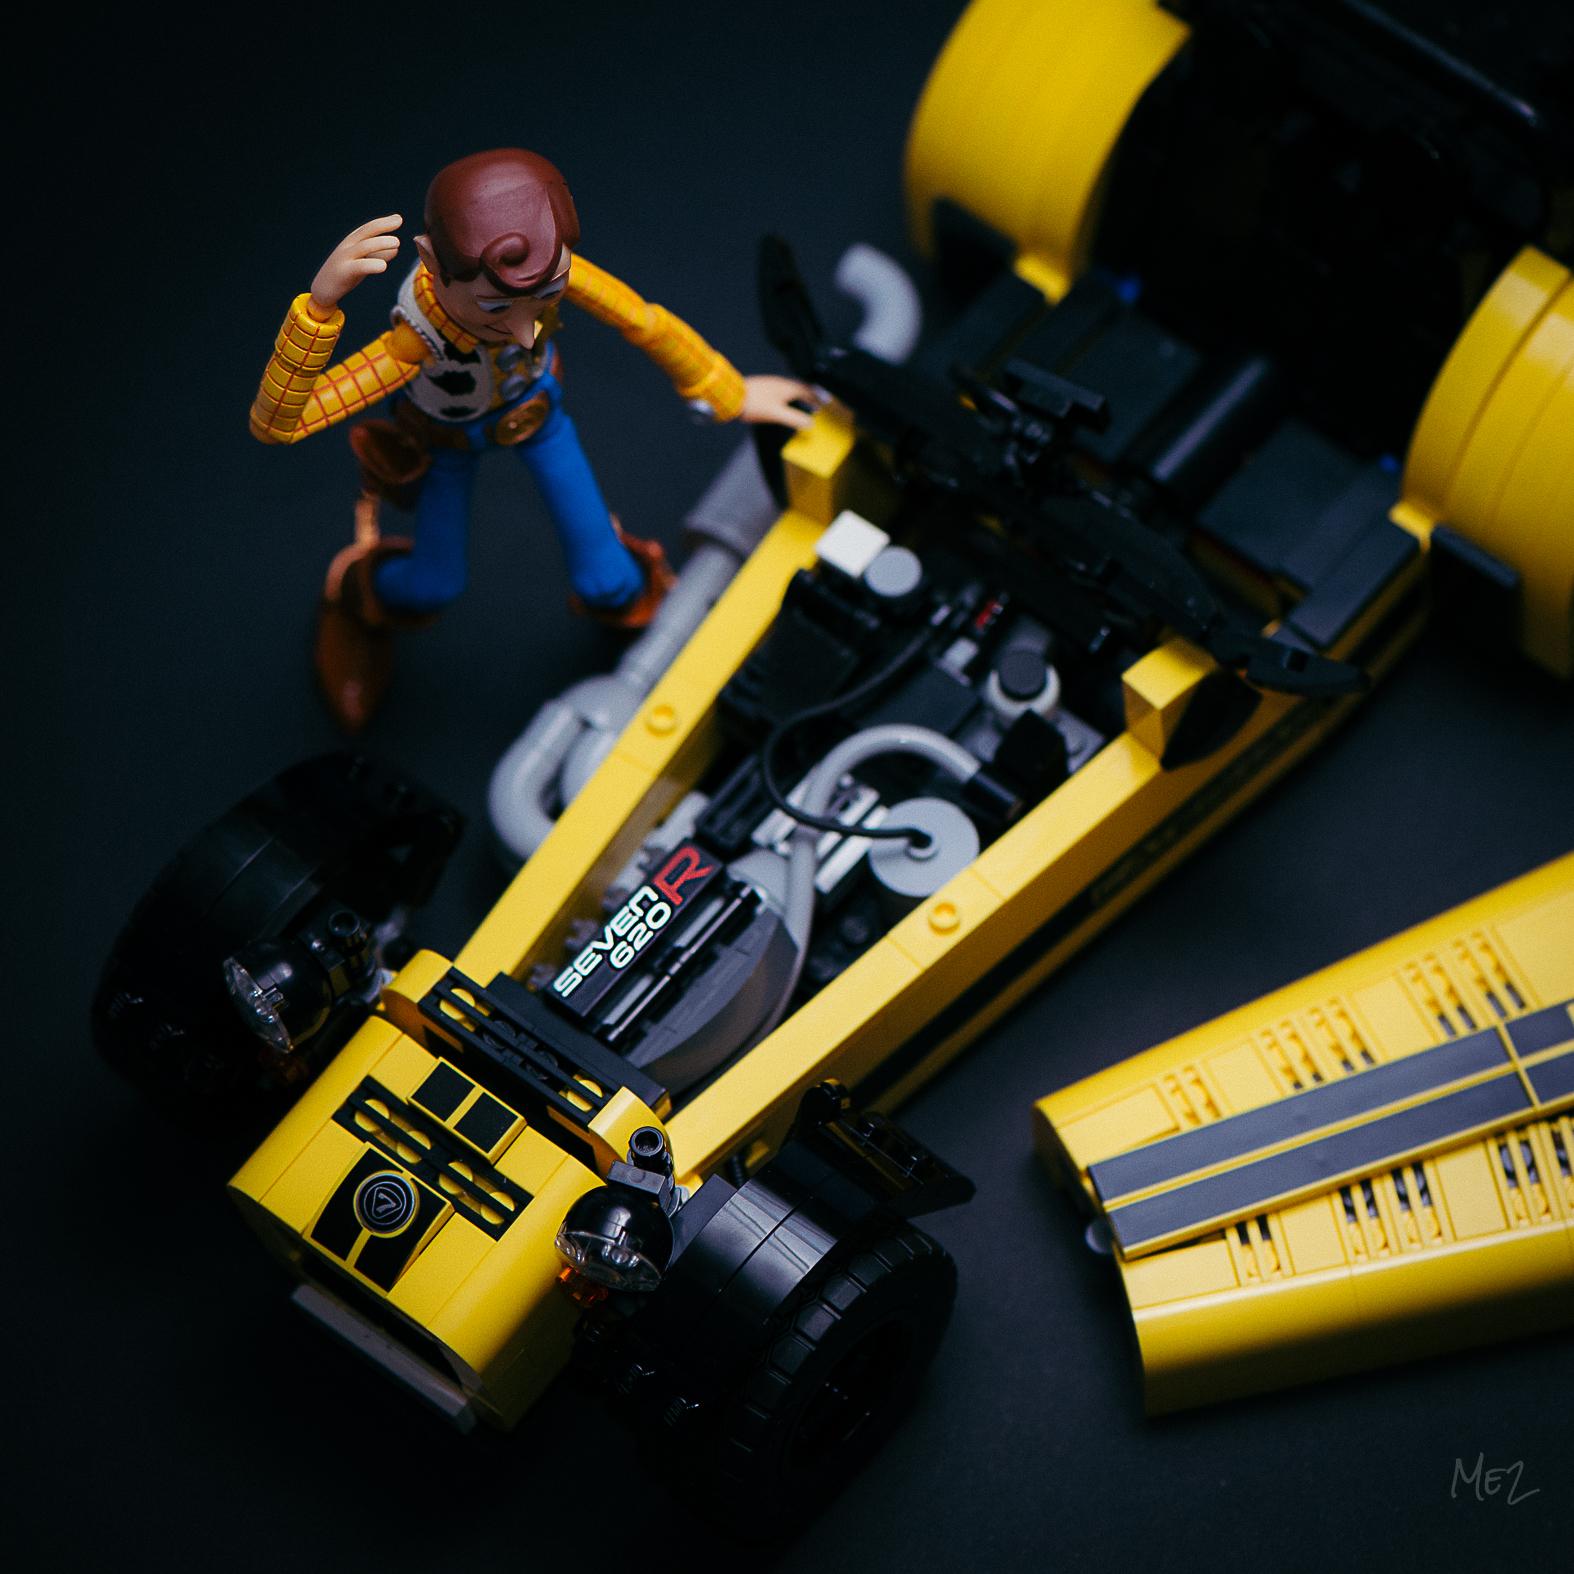 Caterham Seven 620 R - LEGO Edition